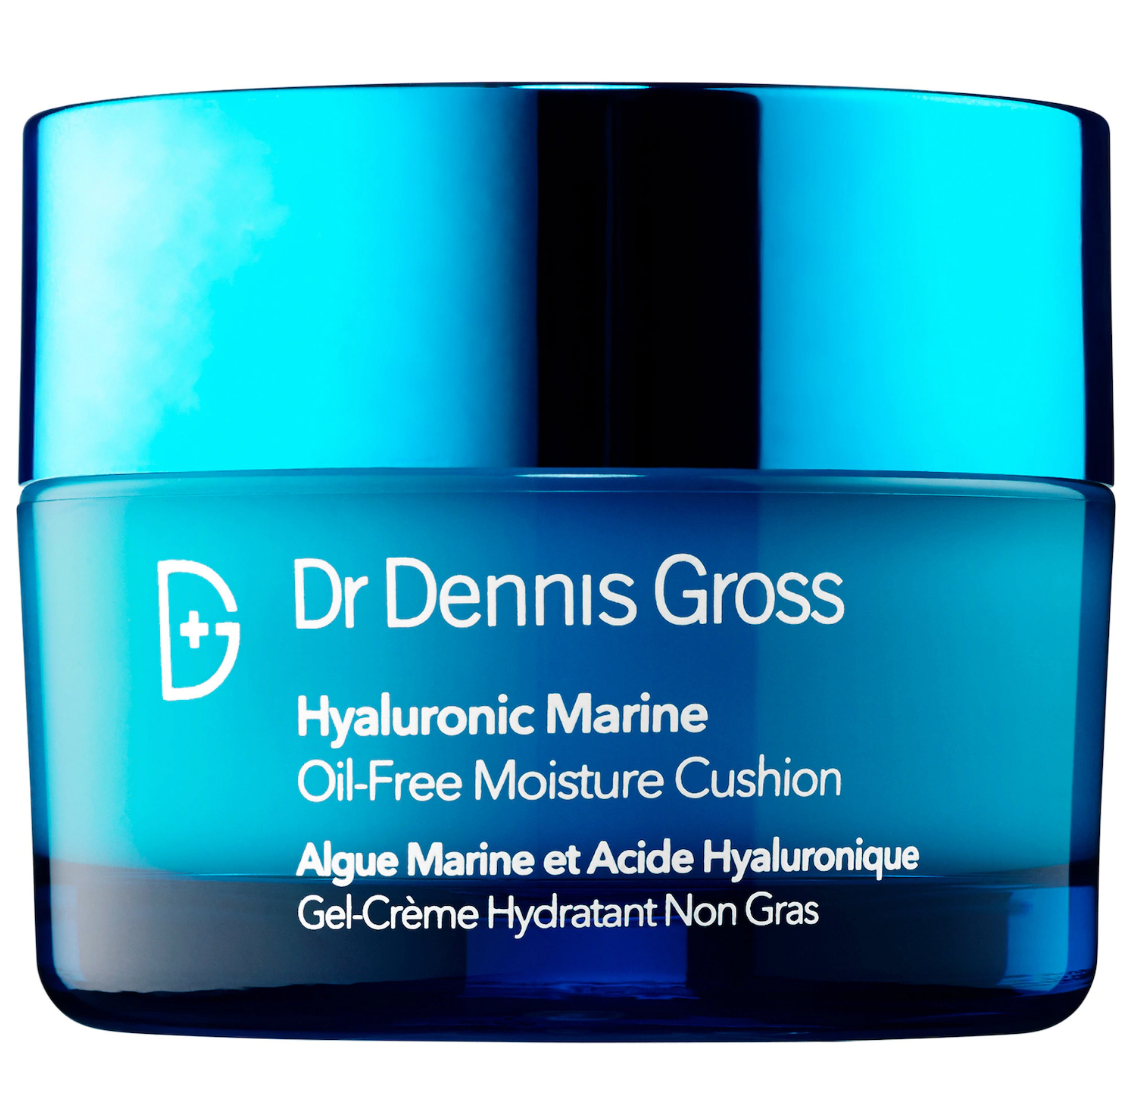 Dr Dennis Gross Hyaluronic Marine Moisturizer Cushion